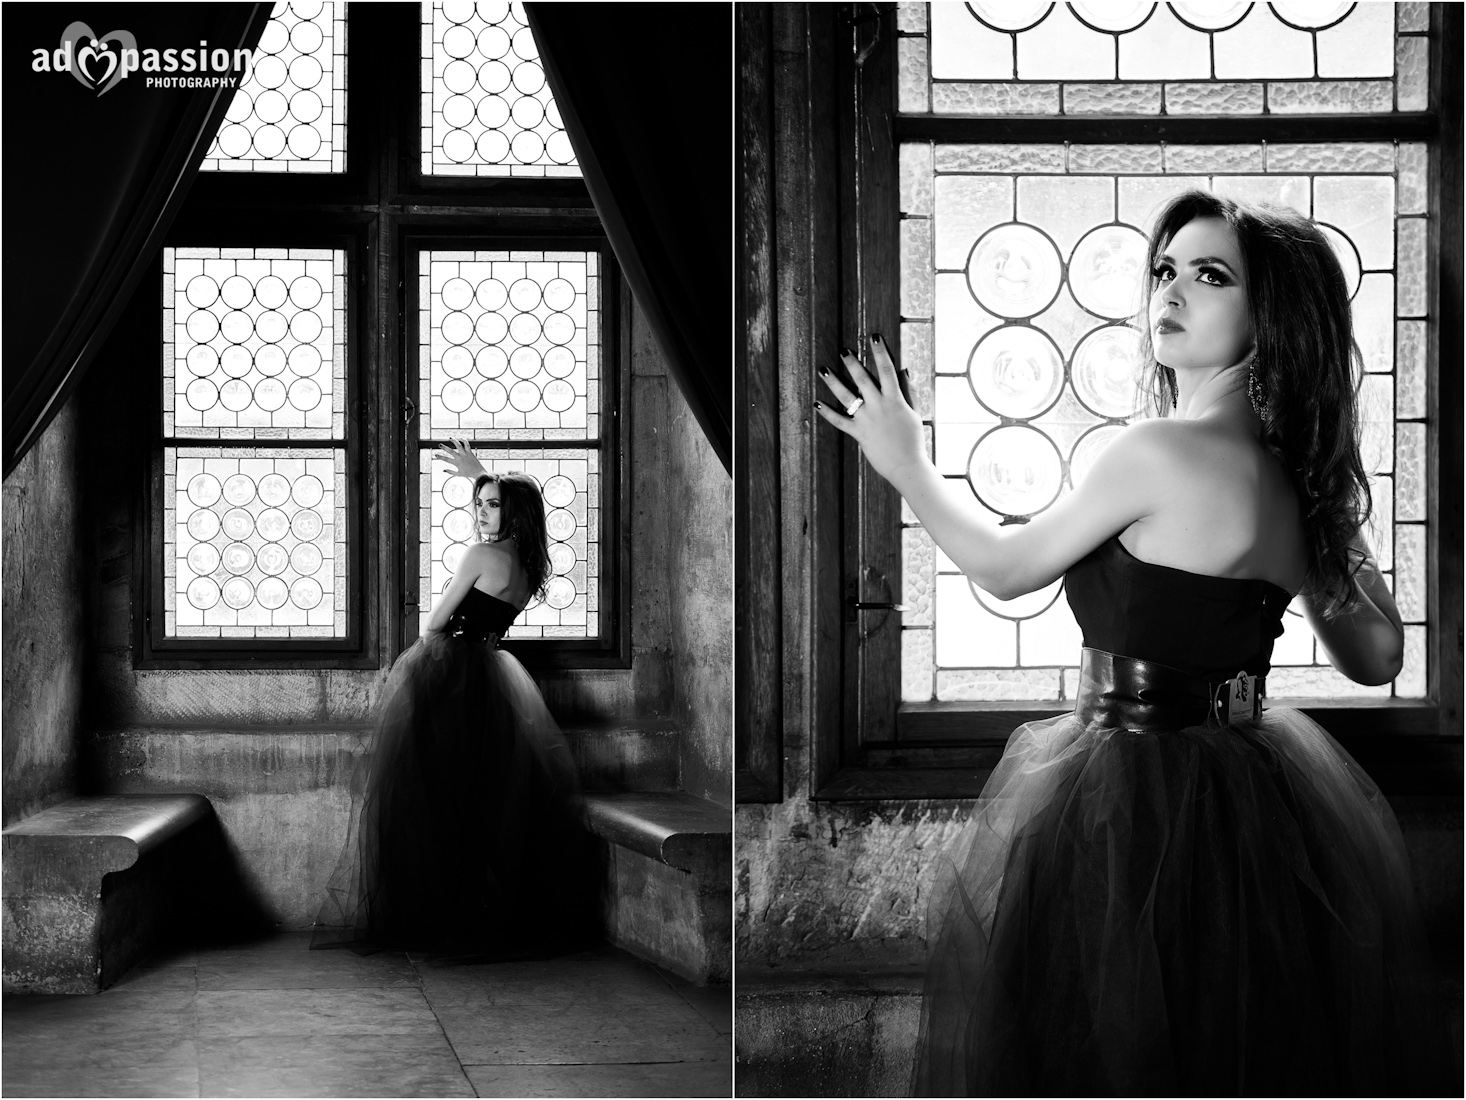 AD Passion Photography | alexandra_castelul_huniazilor_024 | Adelin, Dida, fotograf profesionist, fotograf de nunta, fotografie de nunta, fotograf Timisoara, fotograf Craiova, fotograf Bucuresti, fotograf Arad, nunta Timisoara, nunta Arad, nunta Bucuresti, nunta Craiova